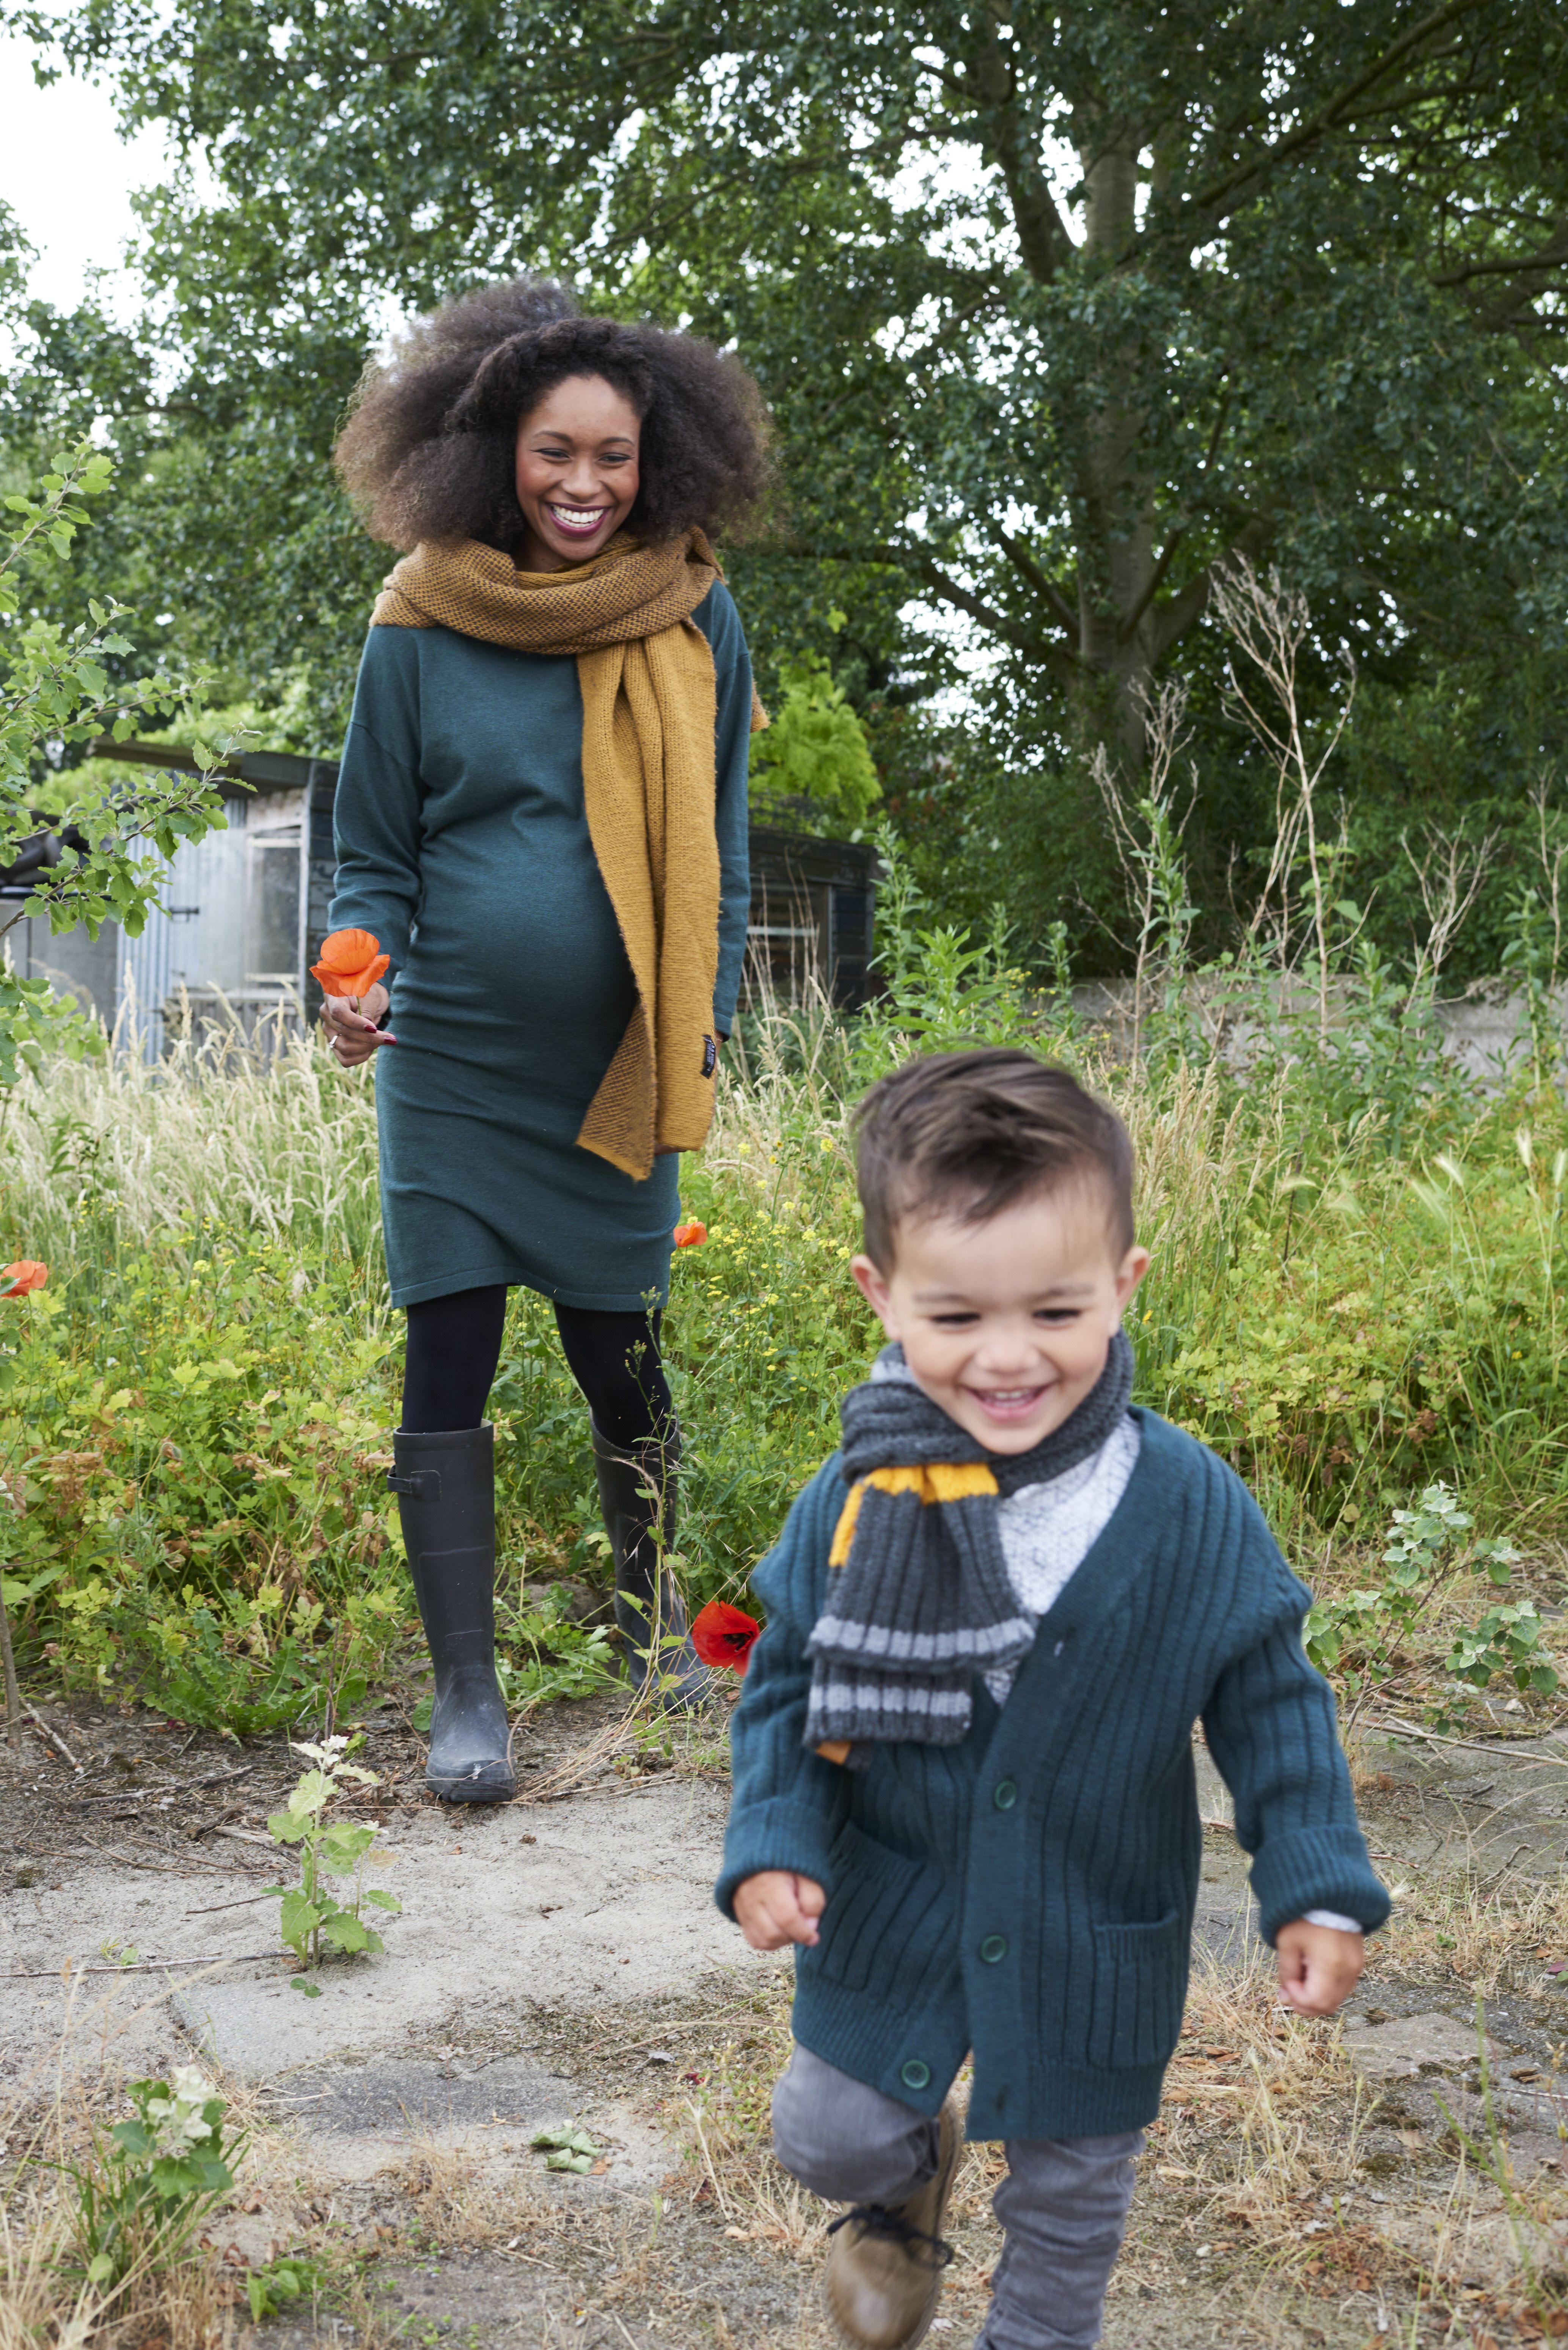 Prenatal Zwangerschapskleding.Prenatal Zwangerschapsjurk Mamafashion Zwangerschapskleding